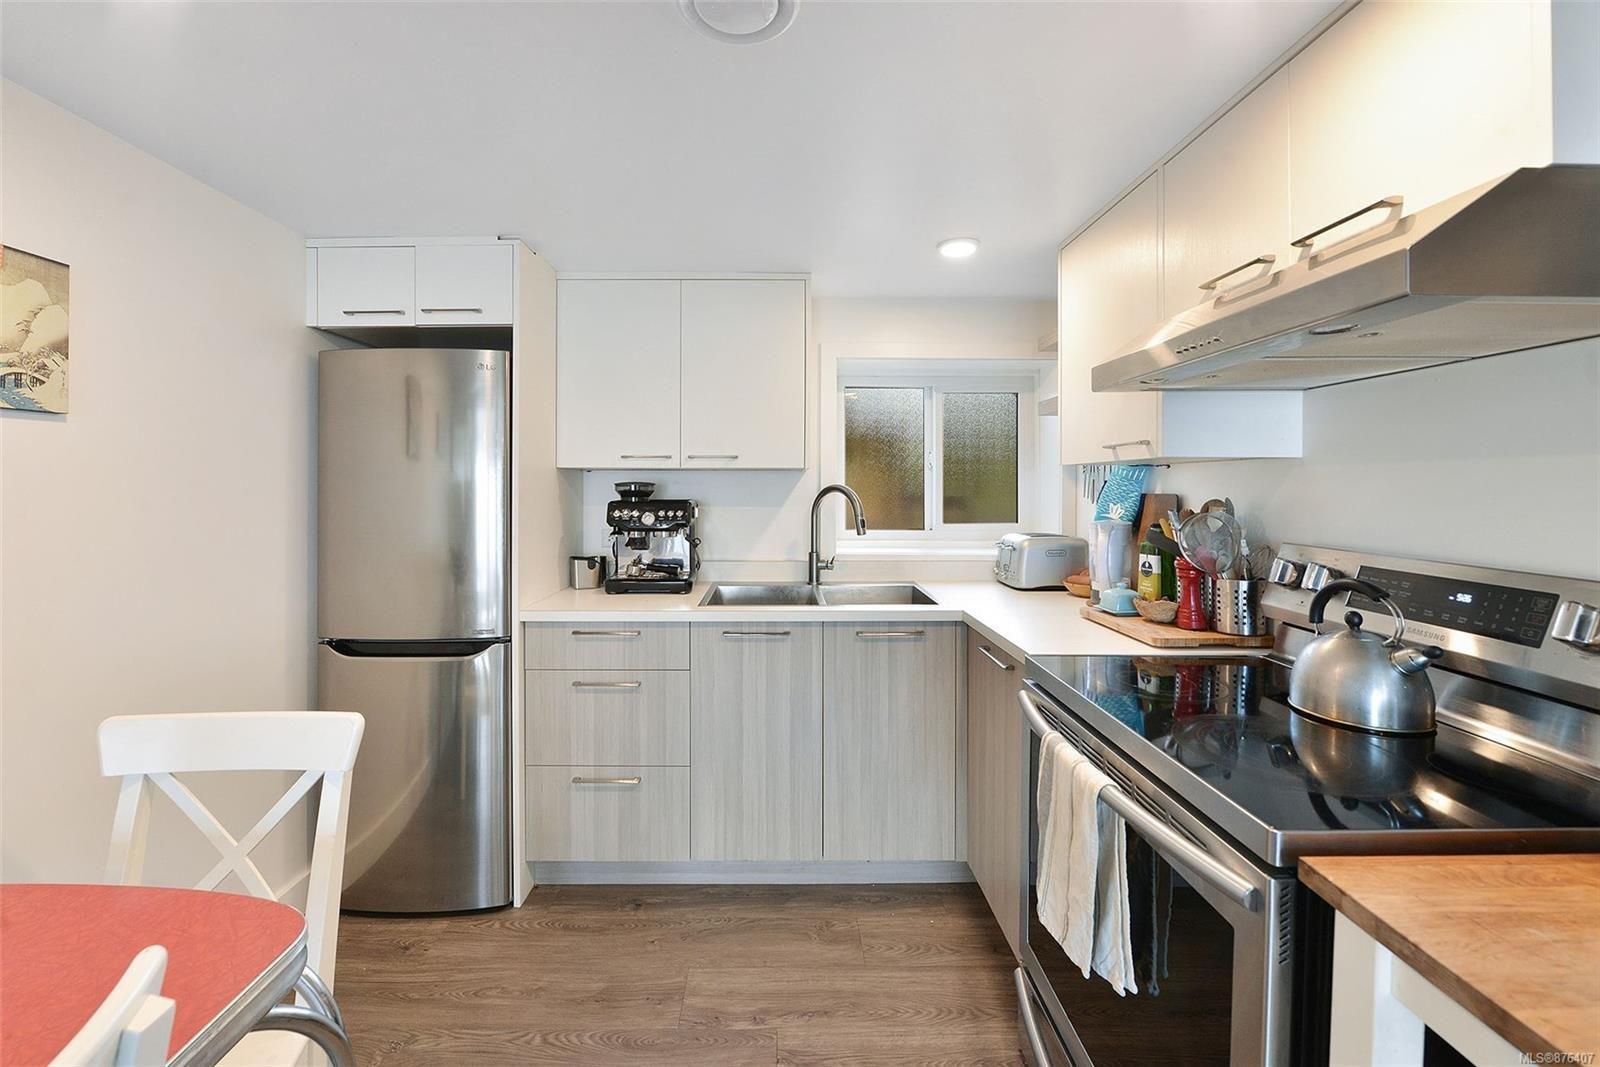 Photo 21: Photos: 631 Cowper St in Saanich: SW Gorge House for sale (Saanich West)  : MLS®# 876407